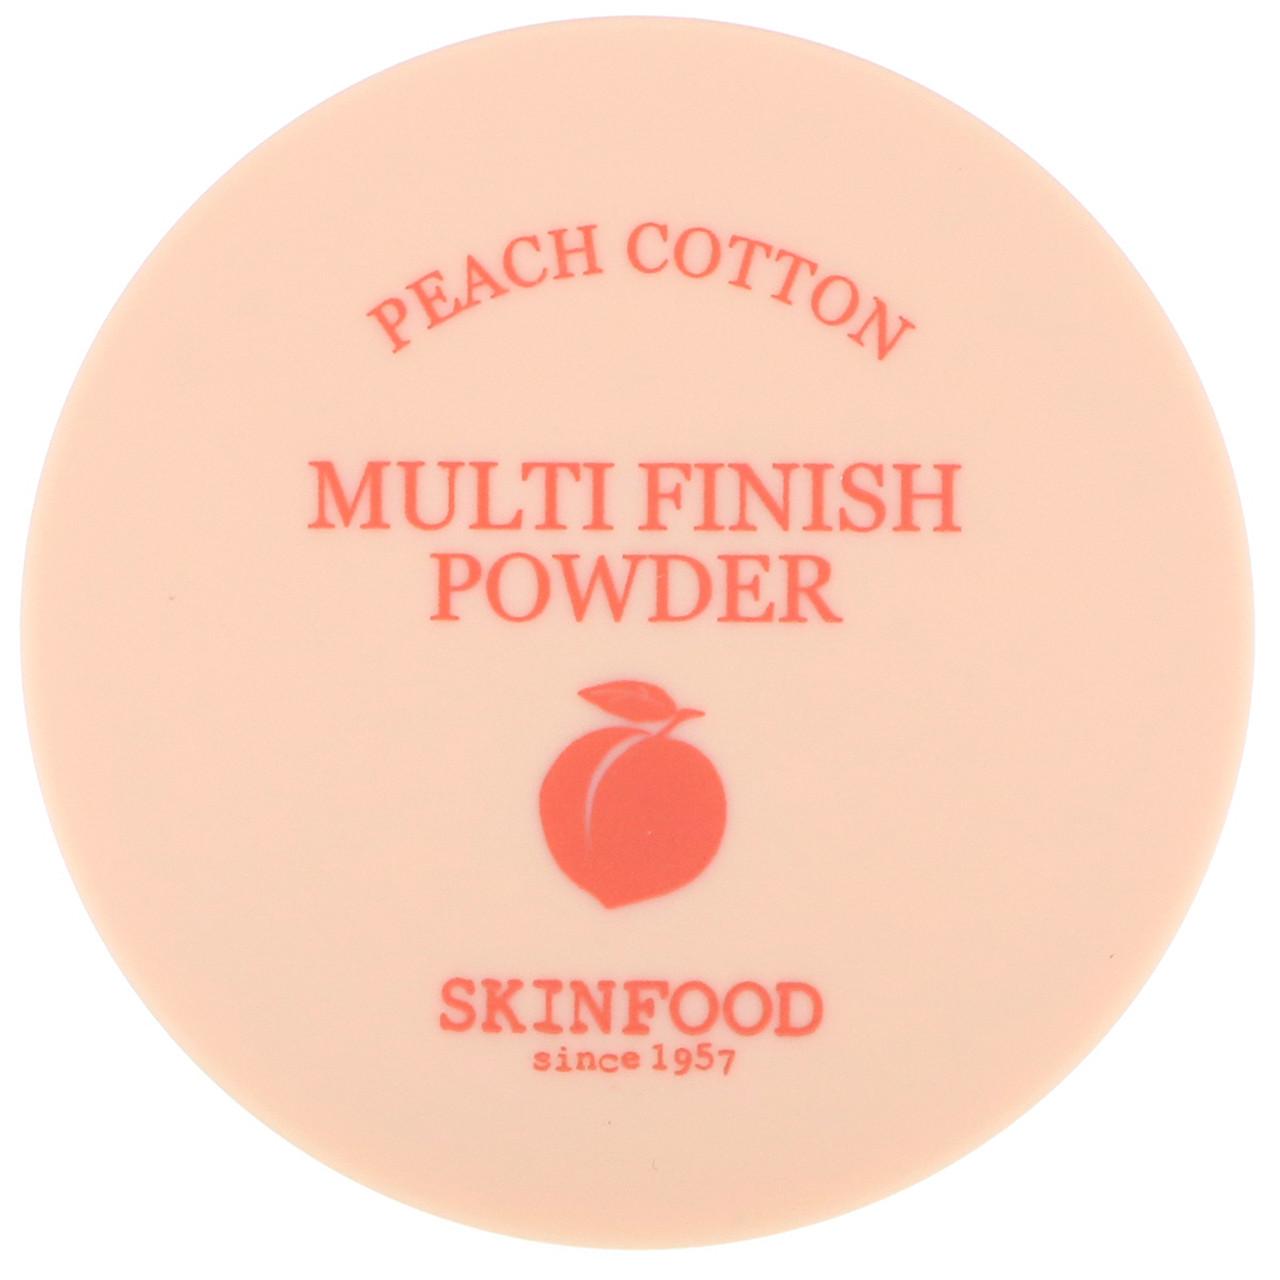 Рассыпчатая финишная пудра Skinfood Peach Cotton Multi Finish Powder